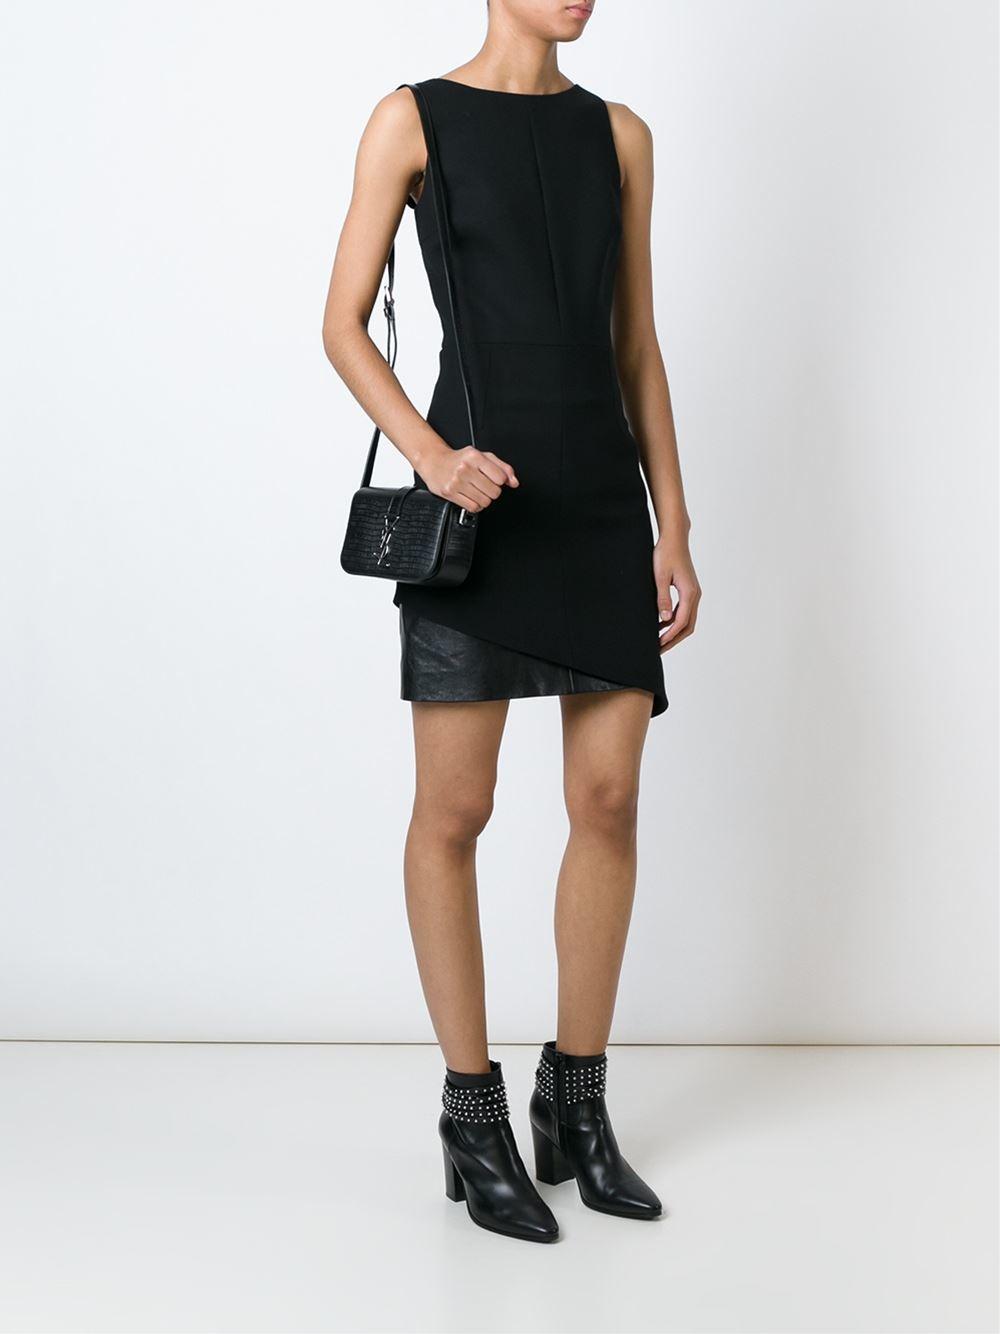 Lyst - Saint Laurent Monogram Universite Leather Shoulder Bag in Black c854f1c61b4d7